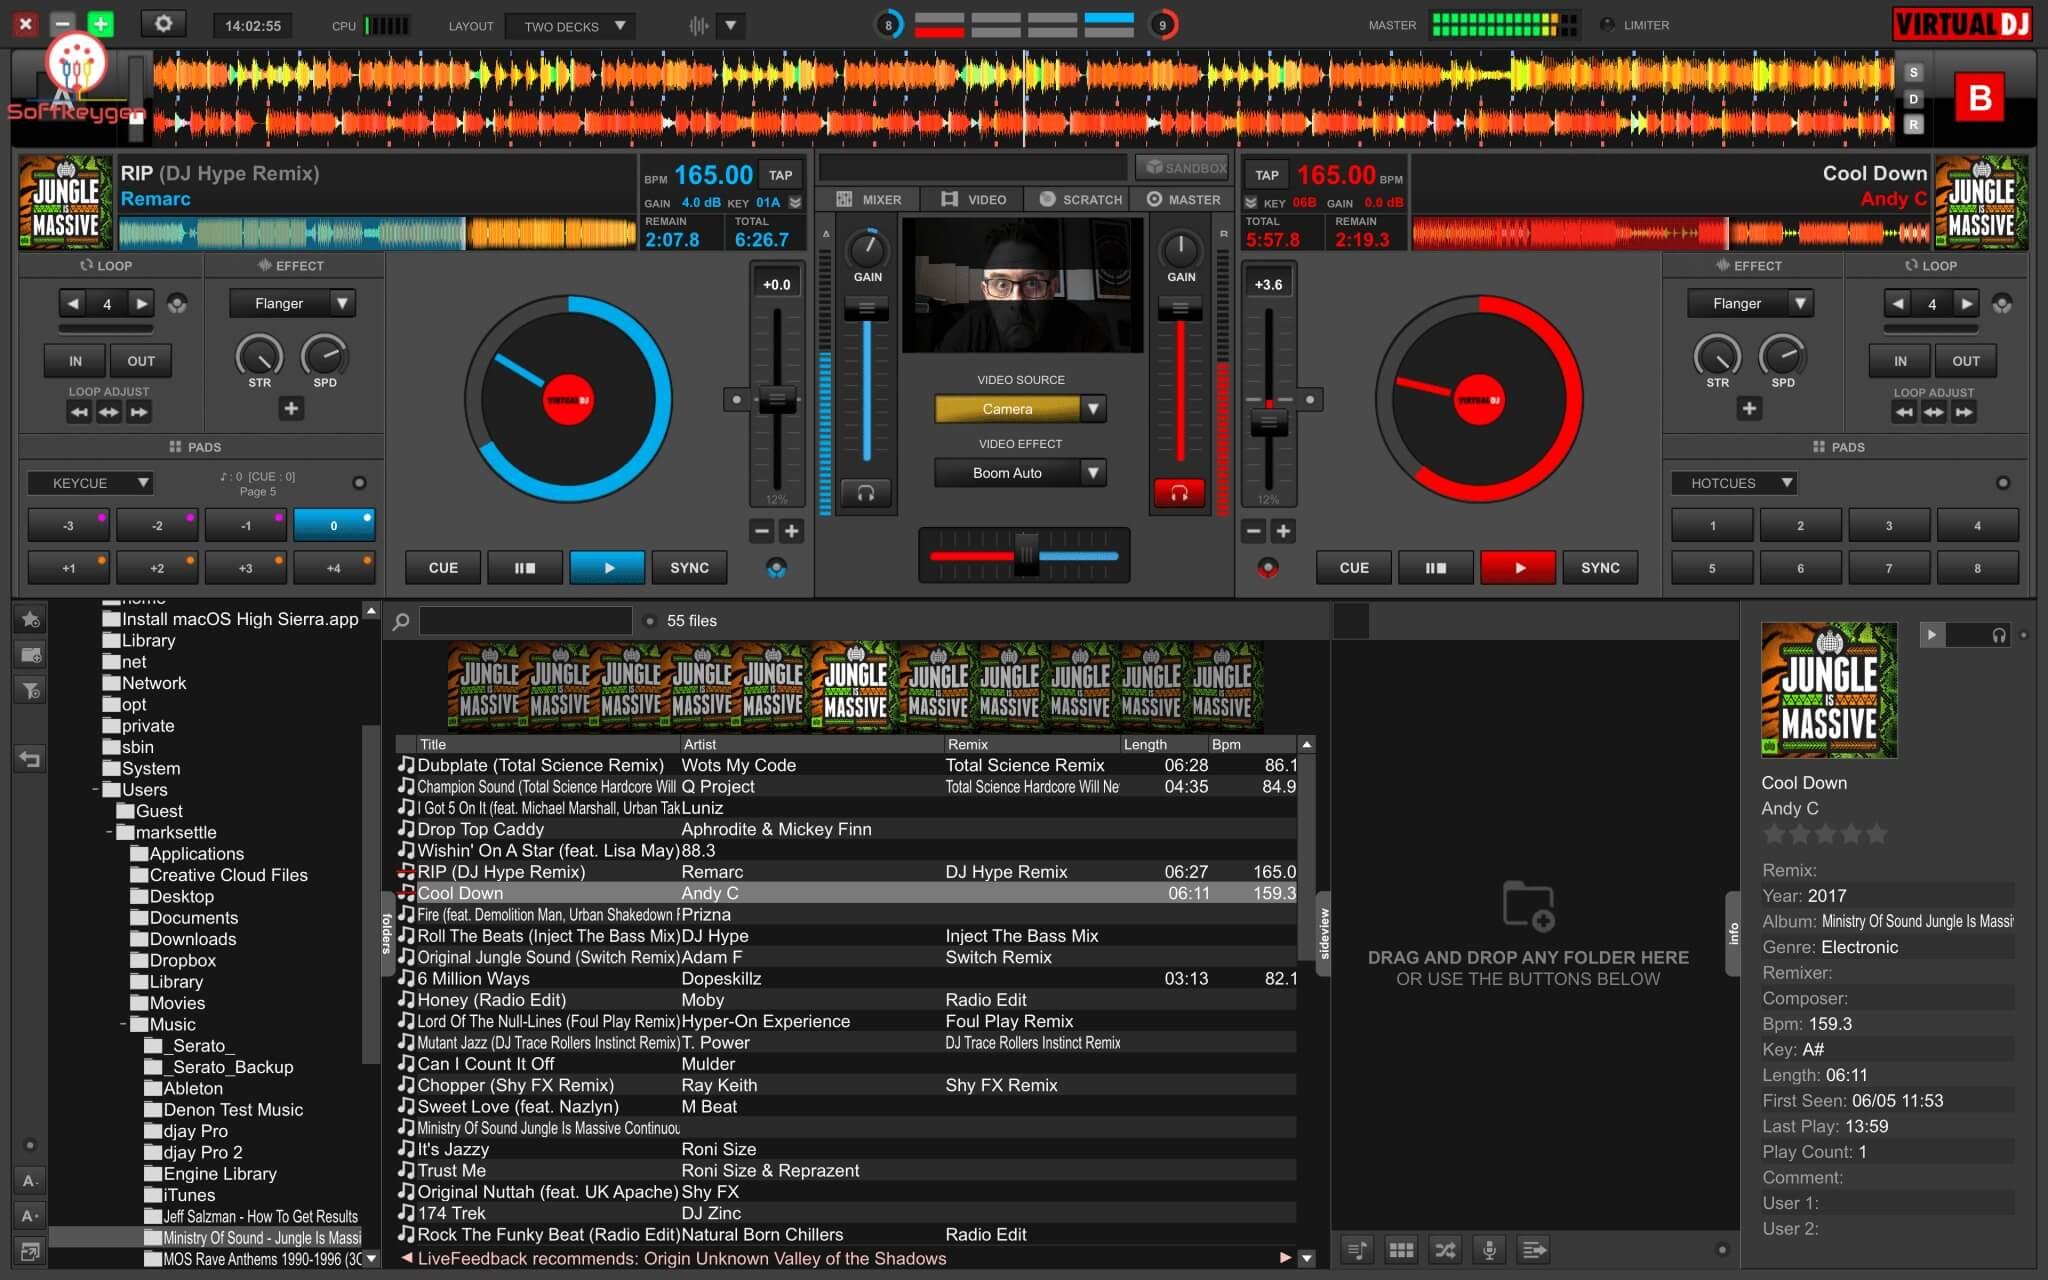 Virtual Dj Pro latest download